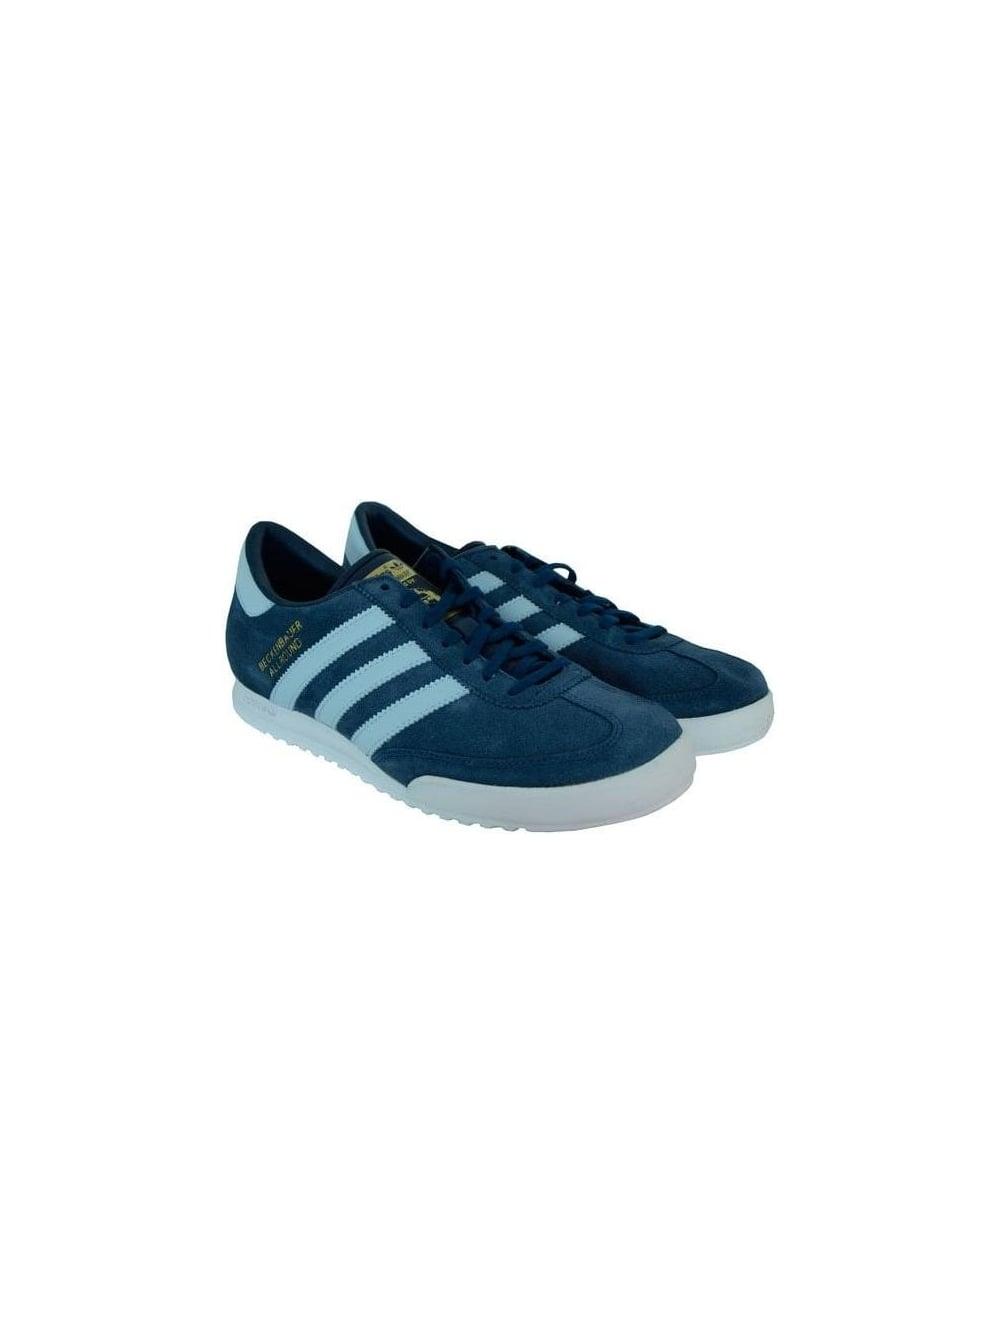 1c135c15f3ef Adidas Beckenbauer Trainer in Indigo White - Shop Adidas Originals ...